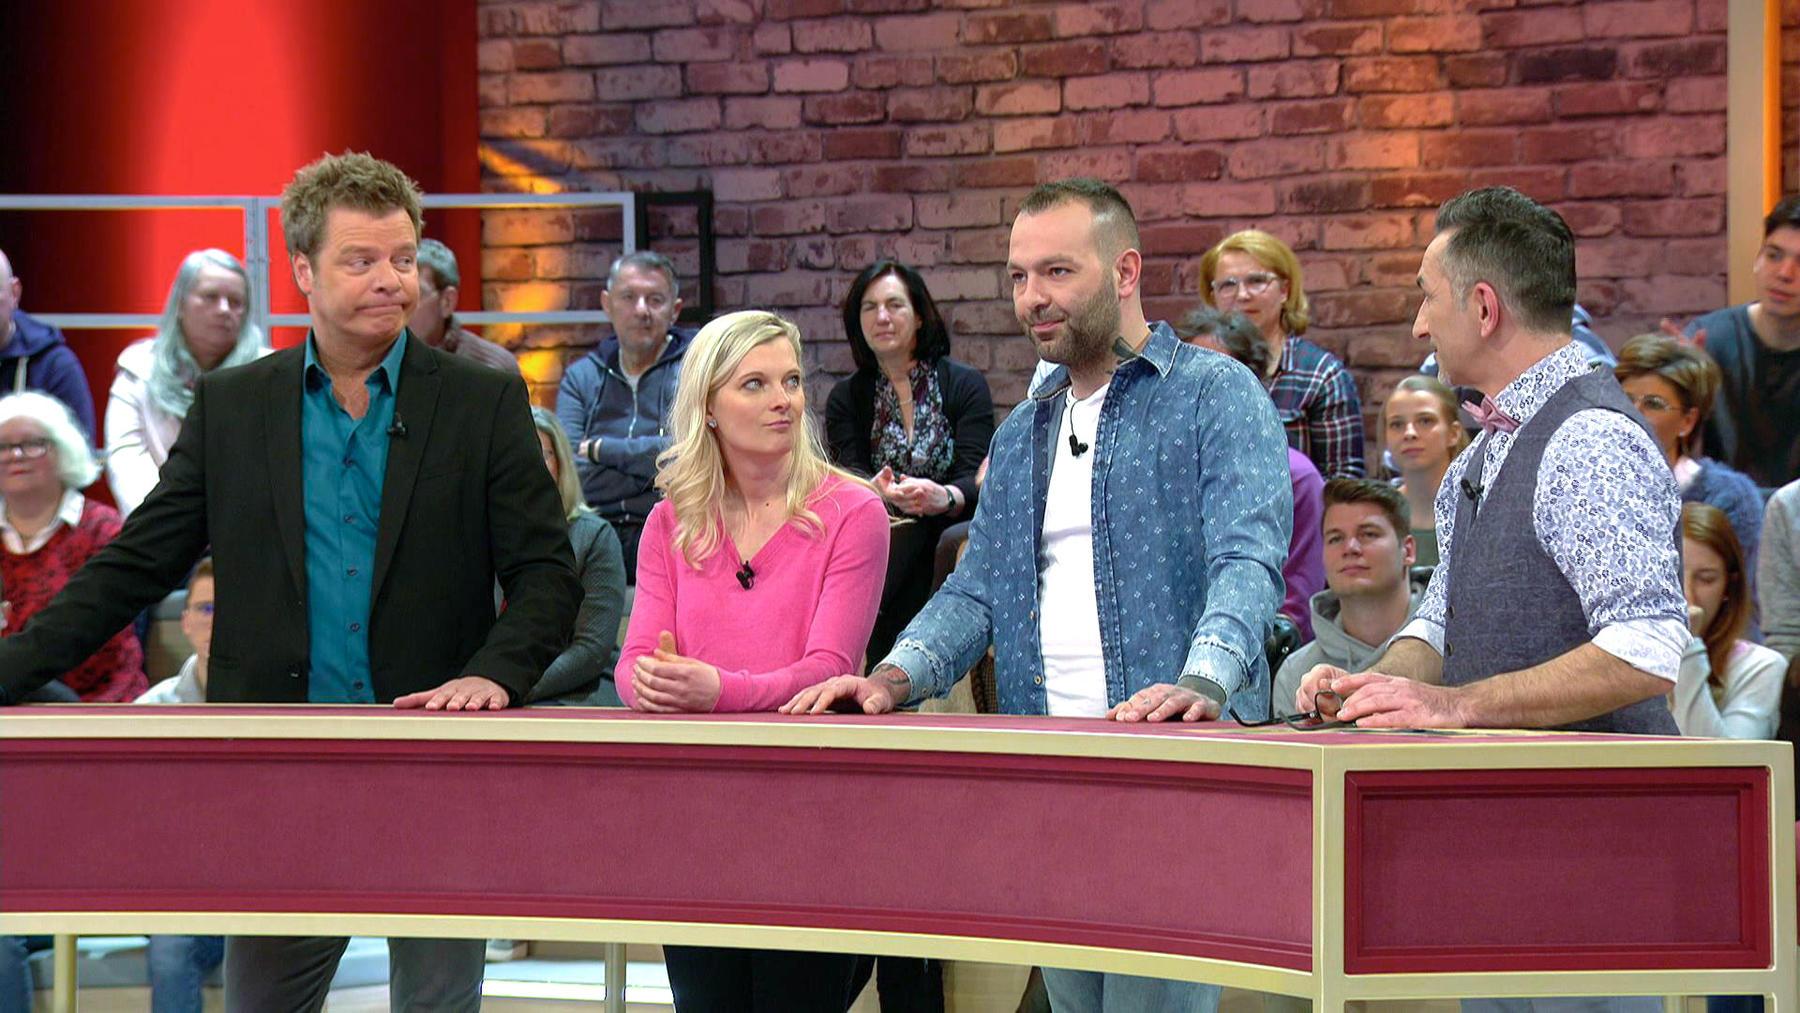 Kandidatenpaar Eleen & Lars / Experte Mauro